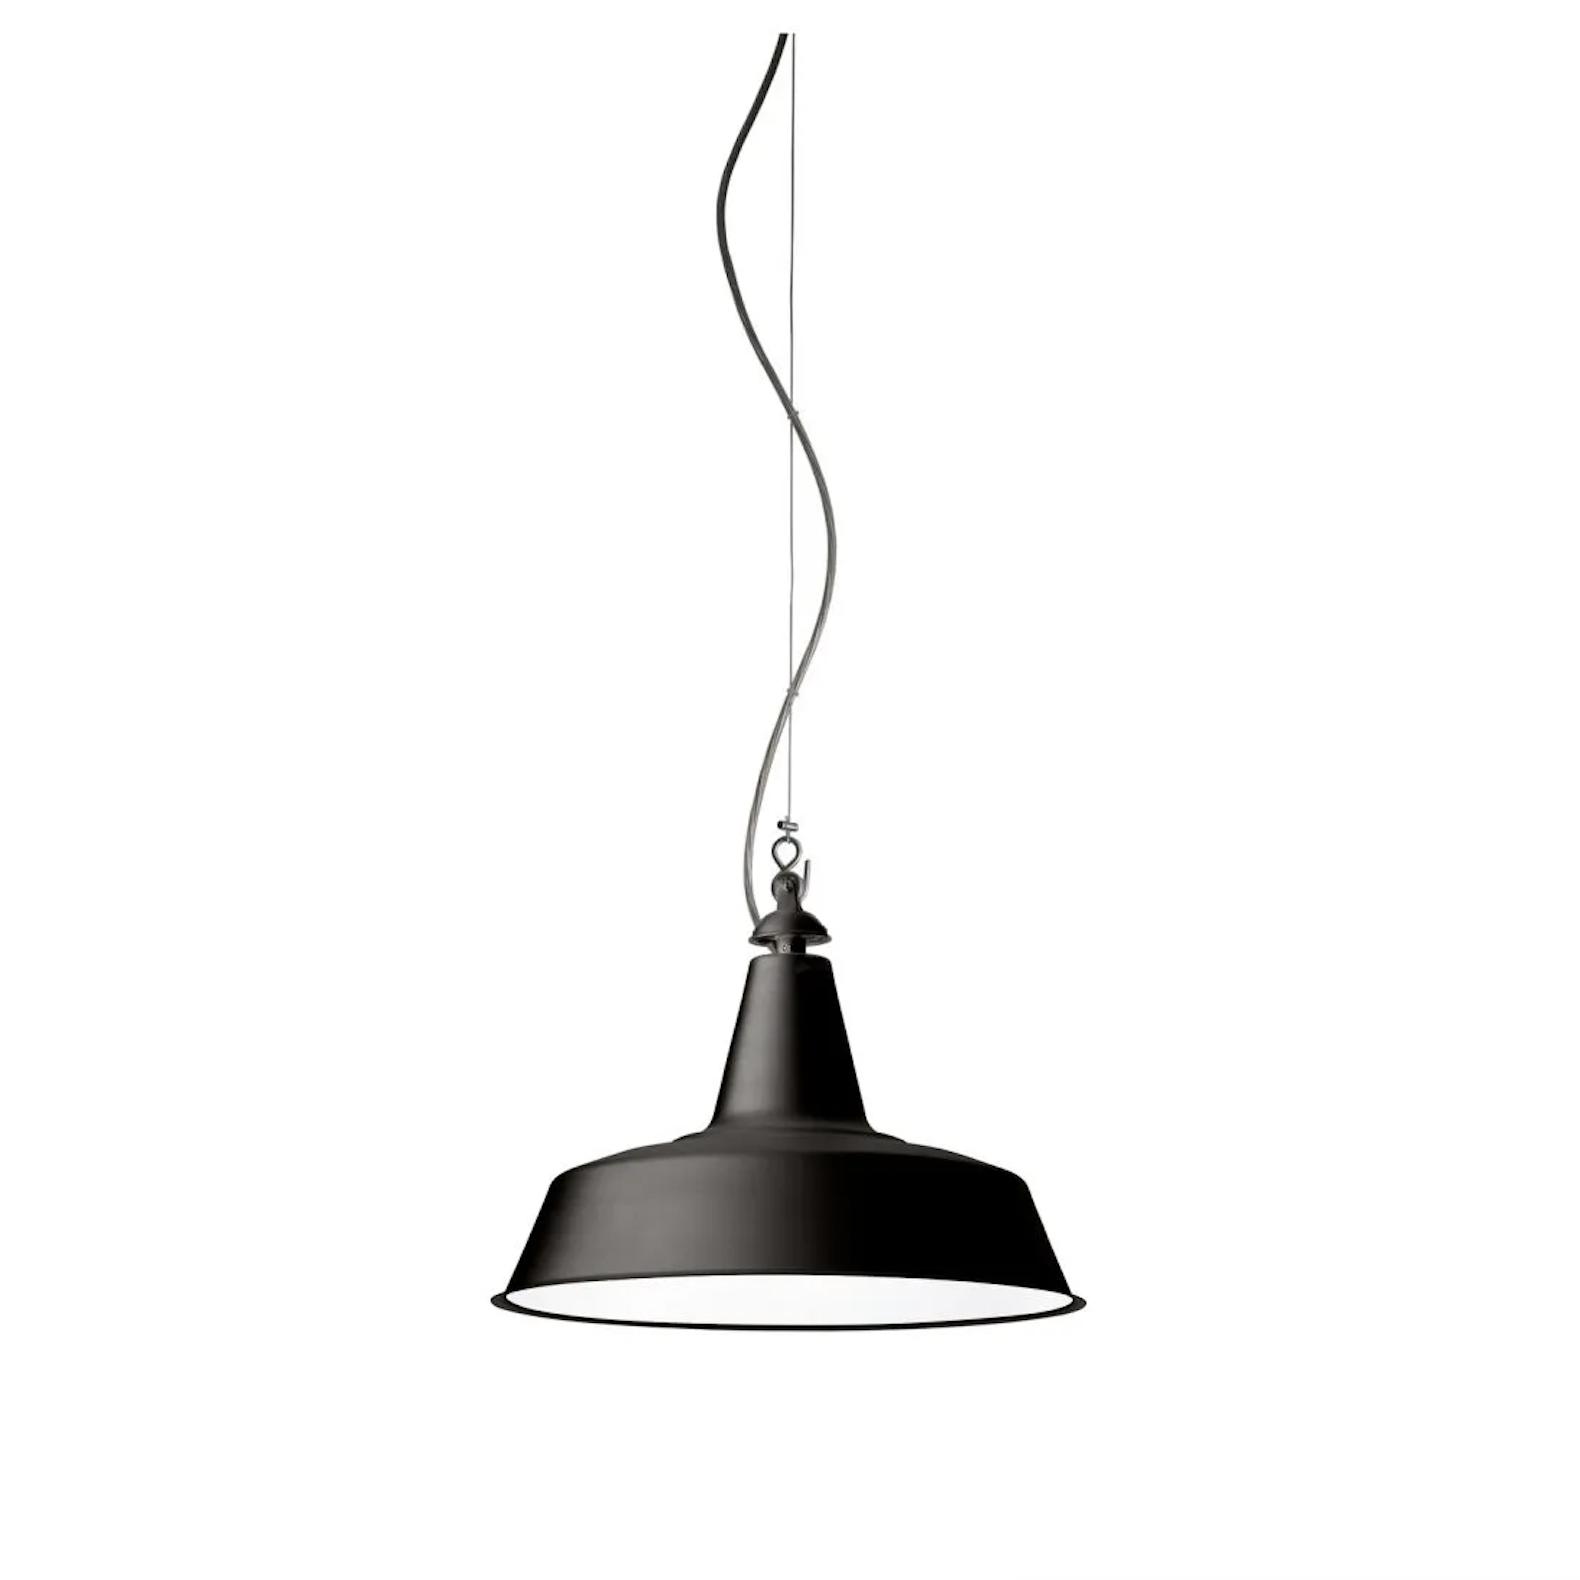 Huna Suspension Lamp